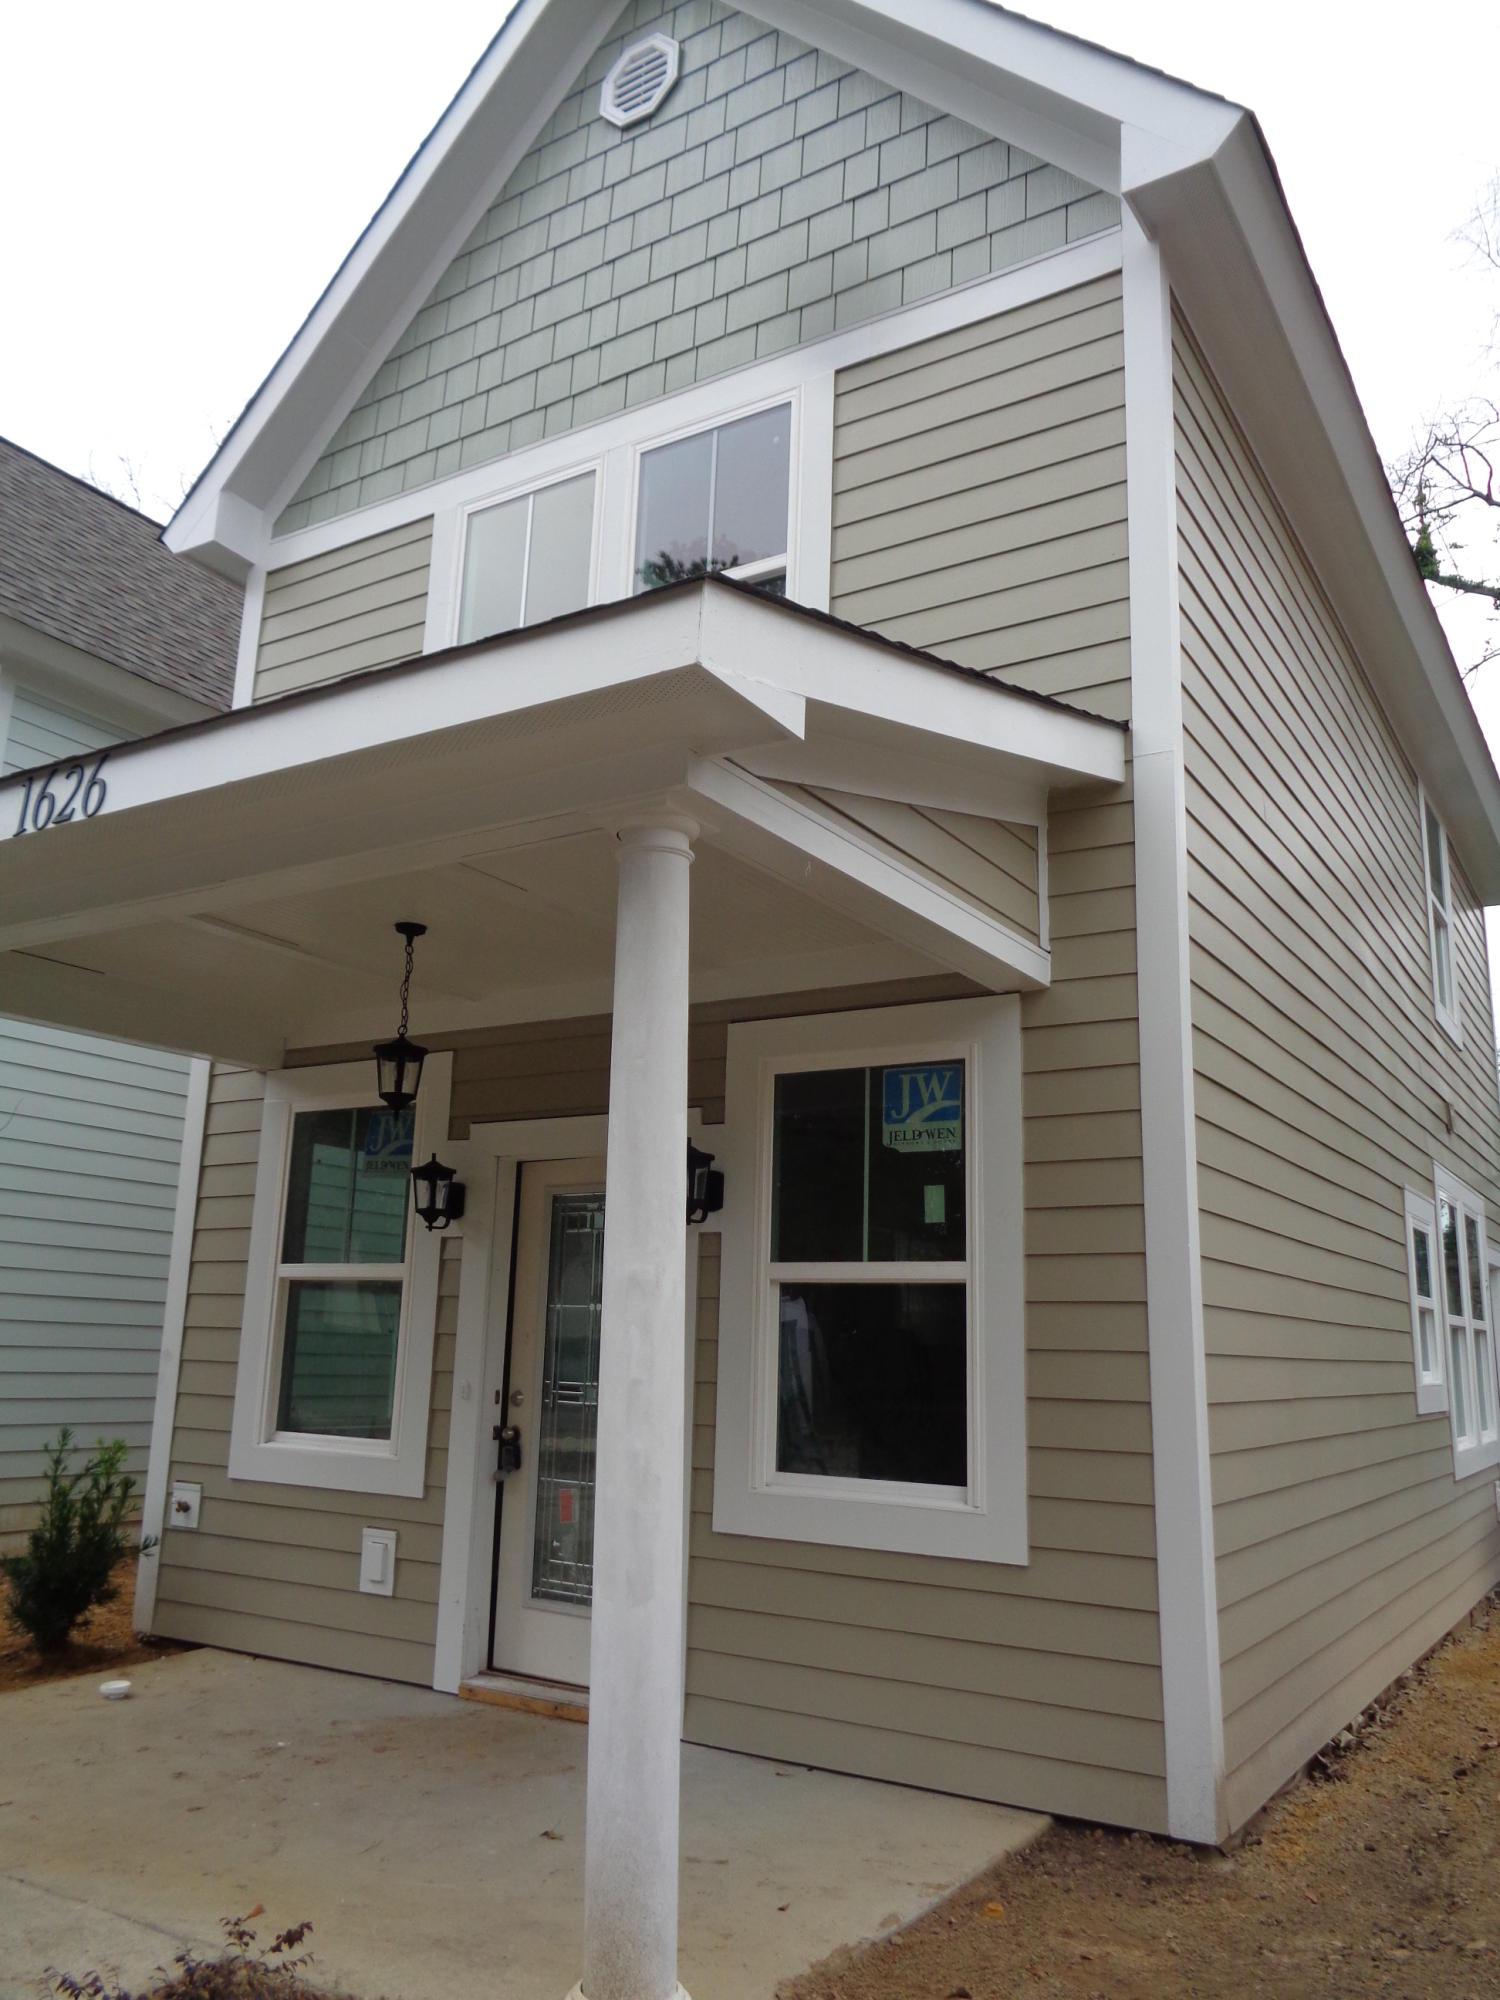 Pinecrest Gardens Homes For Sale - 1626 Wappoo, Charleston, SC - 13